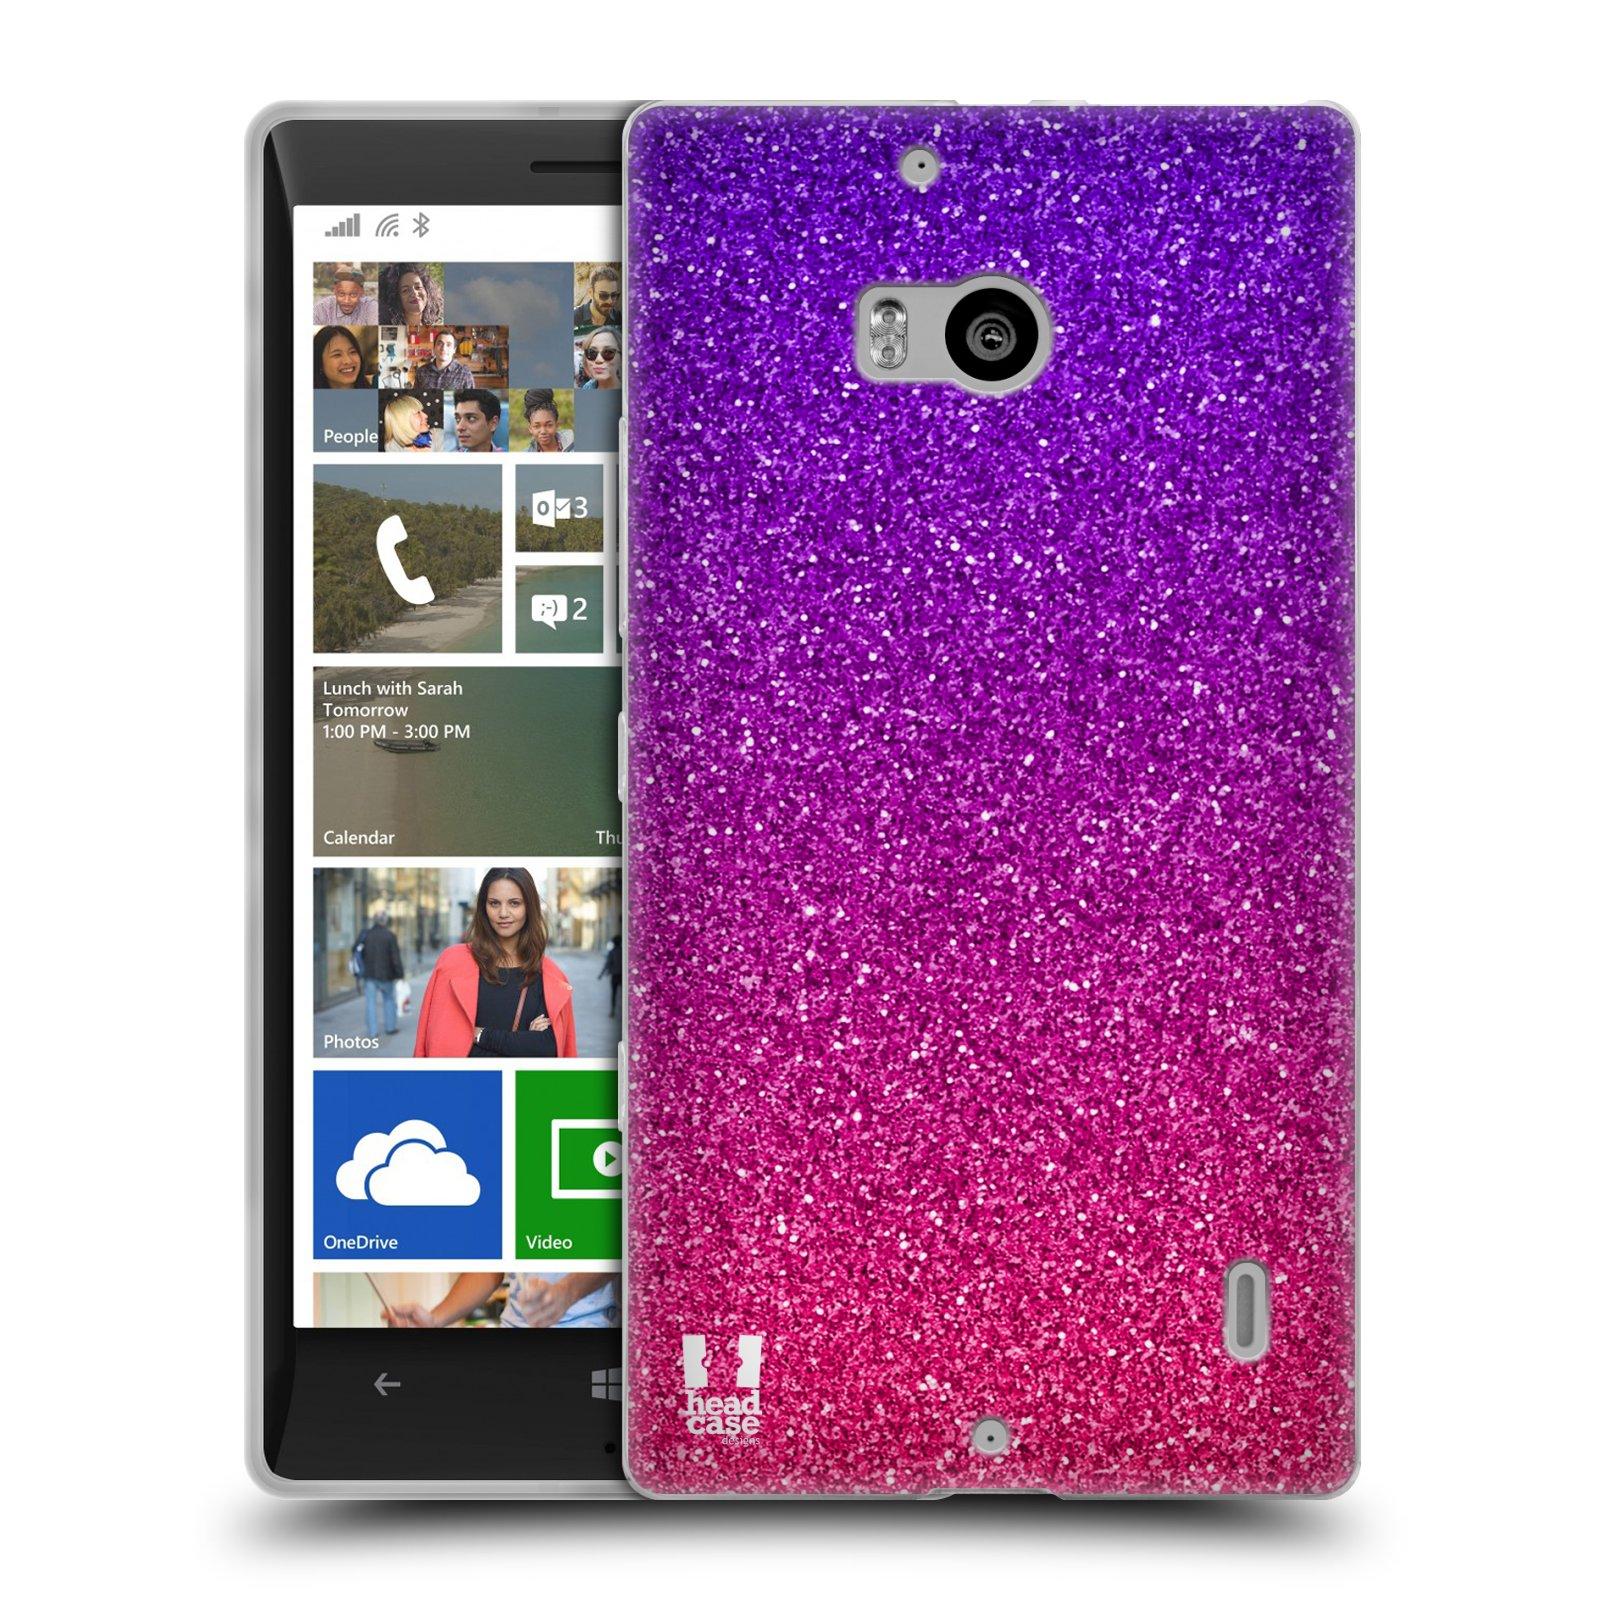 Silikonové pouzdro na mobil Nokia Lumia 930 HEAD CASE MIX PINK (Silikonový kryt či obal na mobilní telefon Nokia Lumia 930)